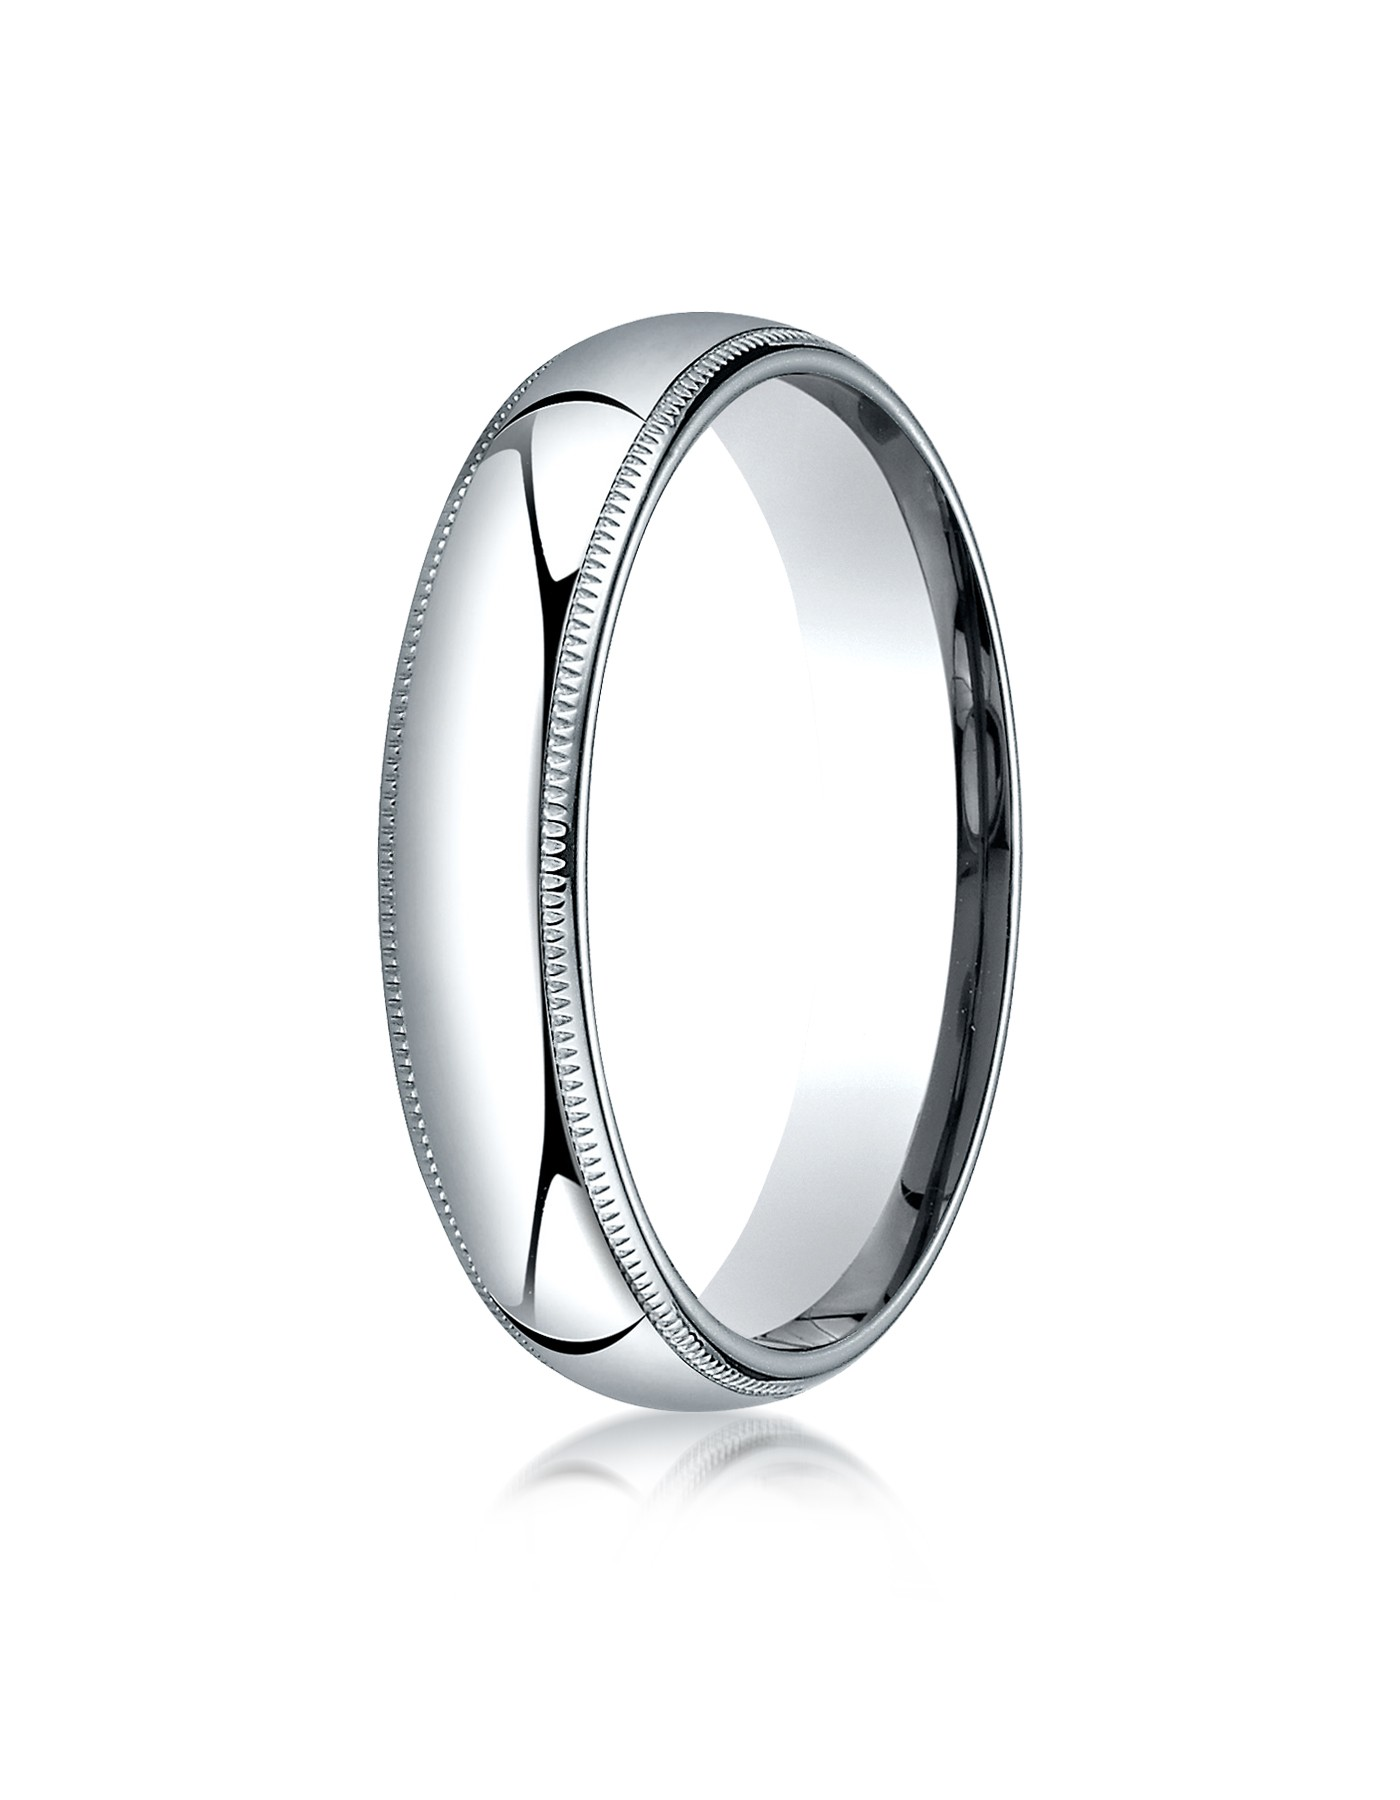 14k White Gold 5mm Slightly Domed Standard Comfort-fit Ring With Milgrain